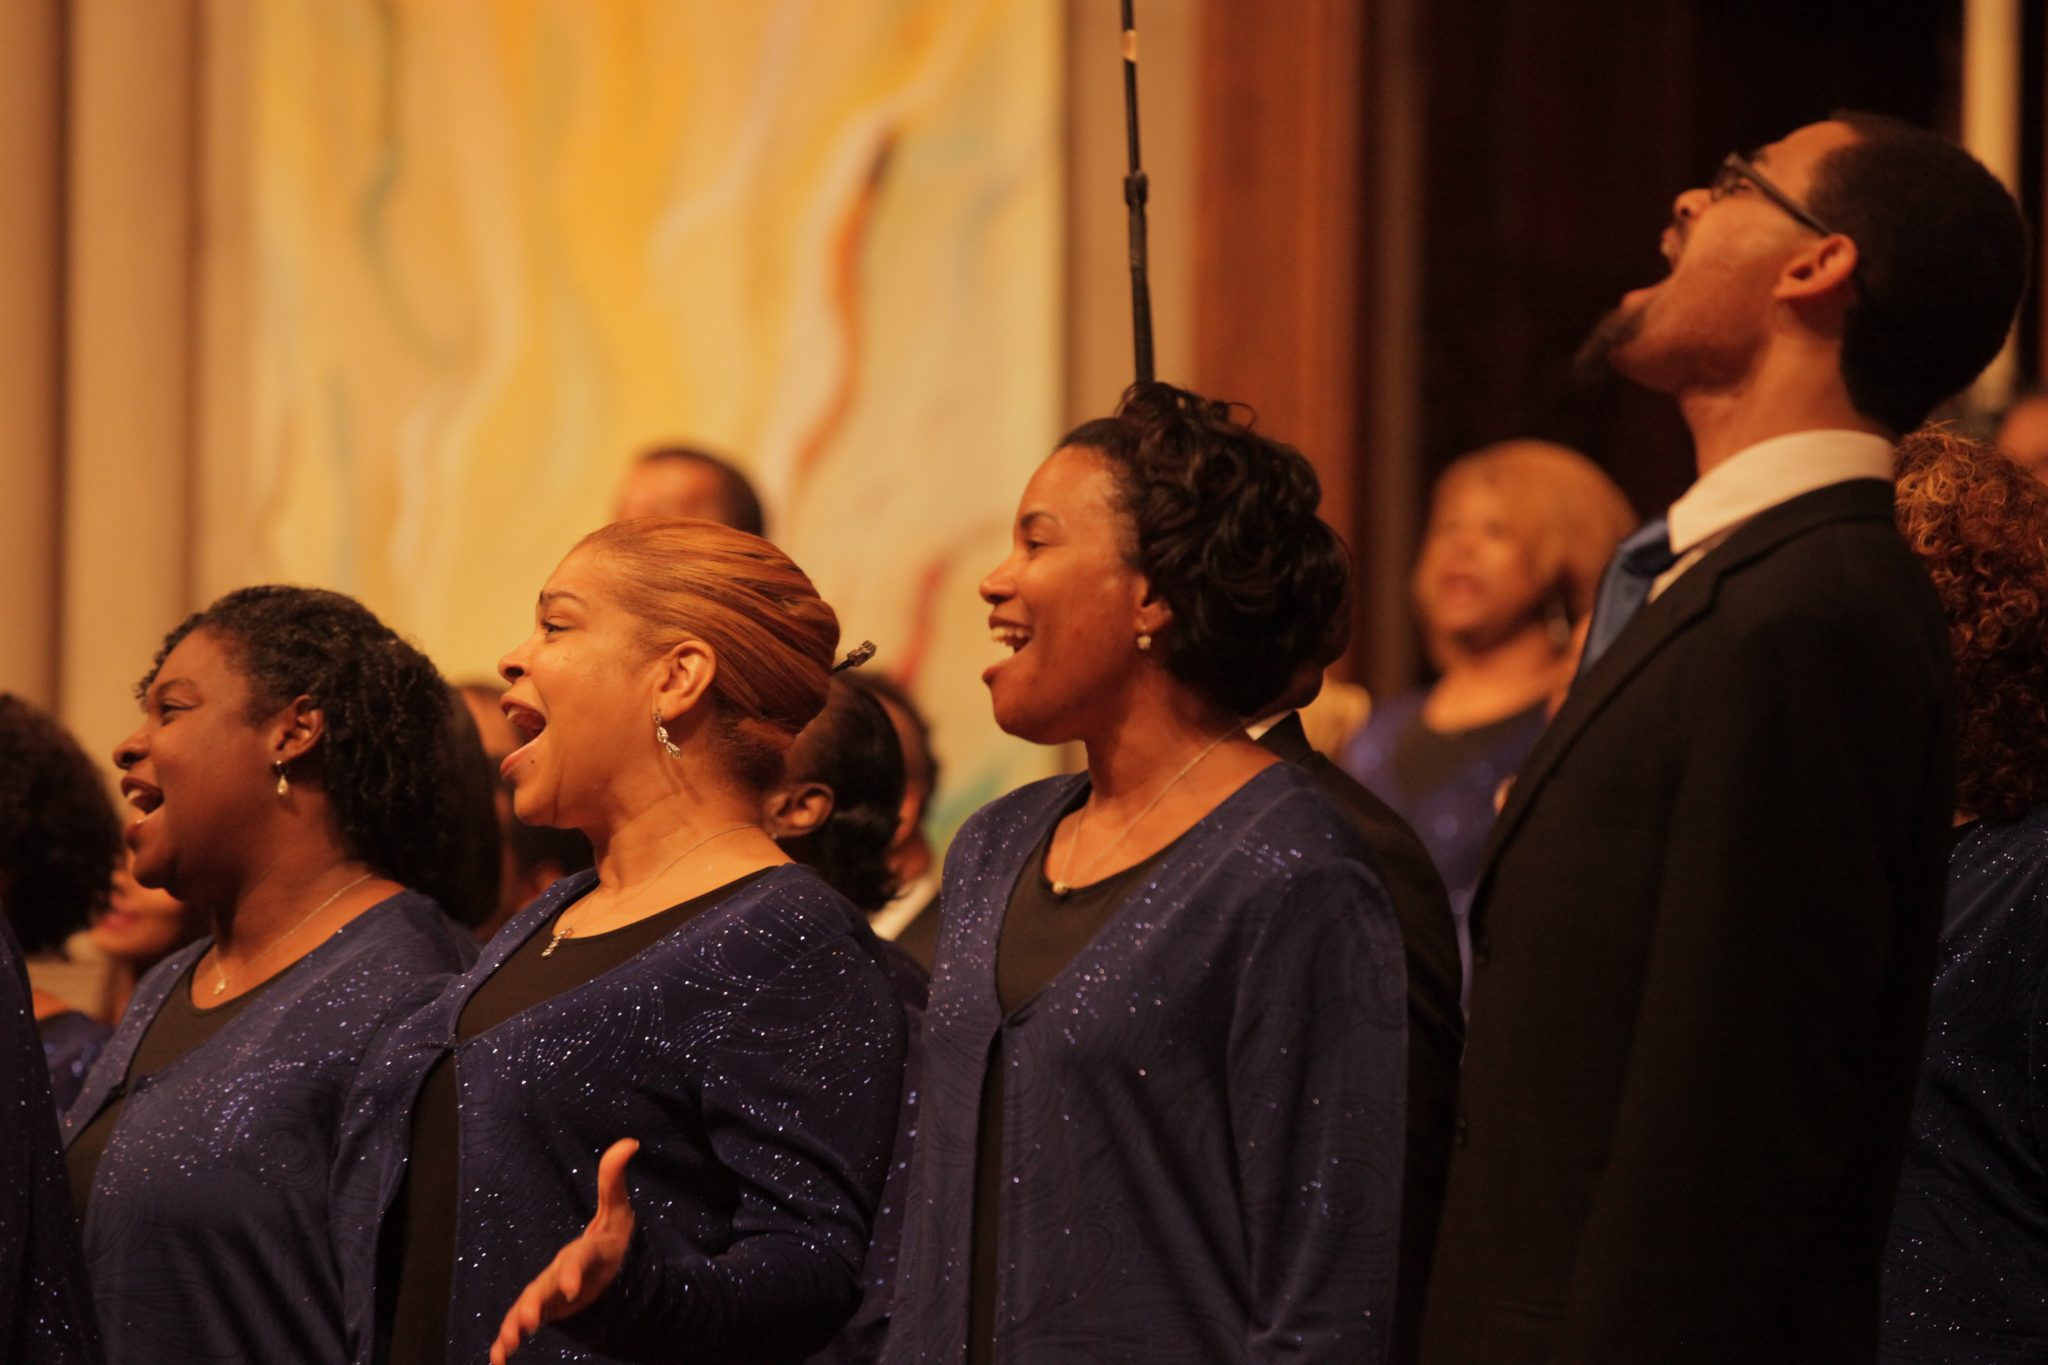 Men & Women of the Gospel Choir (Courtesy of Washington Performing Arts)